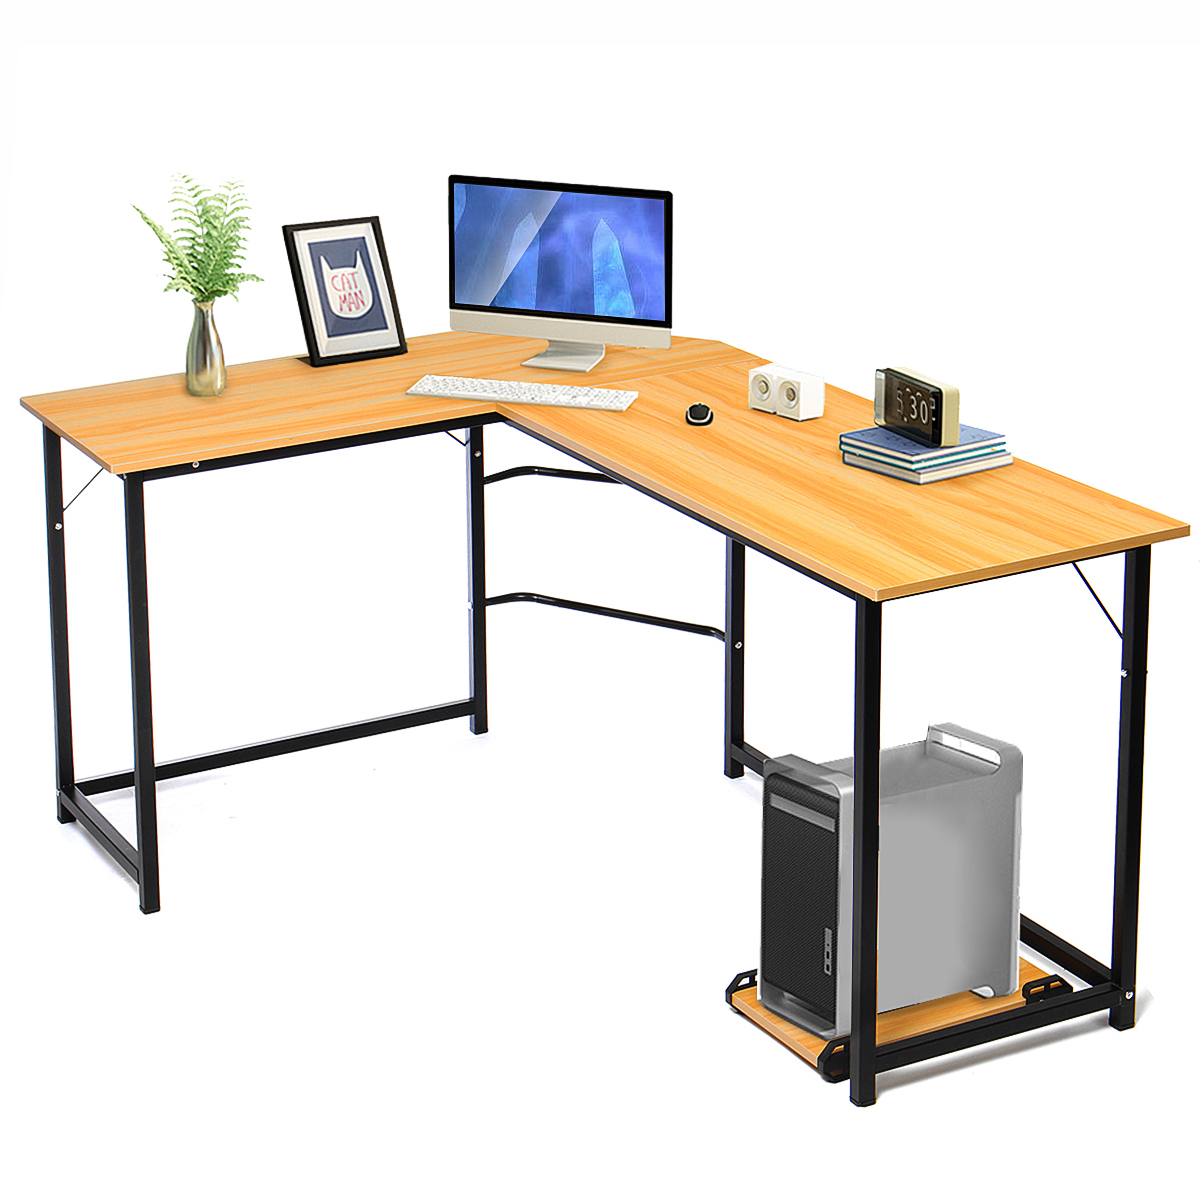 Wooden Office Computer Writing Desk Home Gaming PC Furnitur L-Shape Corner Study Computer Table Laptop Desk Laptop Table